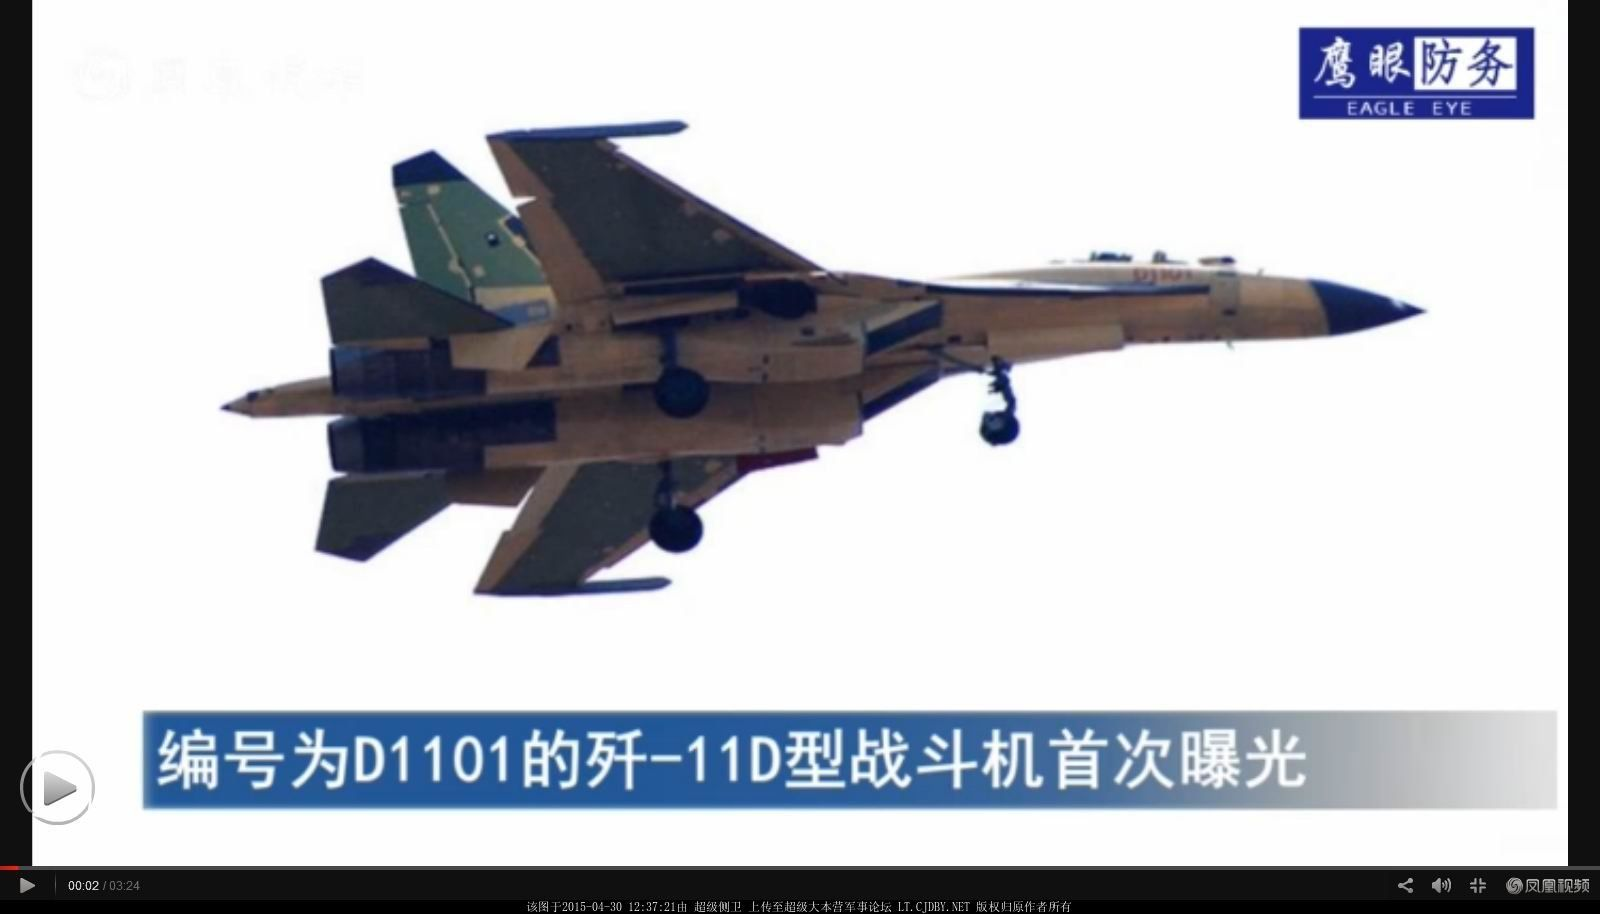 China Su-27 J-11D Flanker